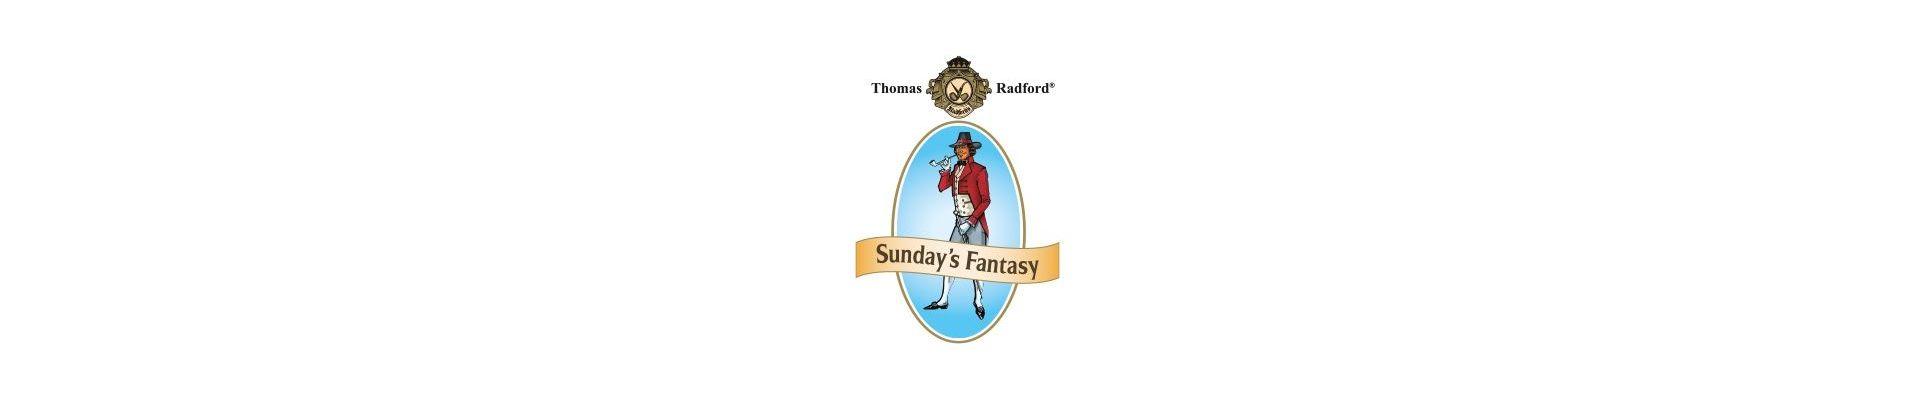 Tigari de foi Thomas Radford Sunday s Fantasy cu livrare.Pret tigari